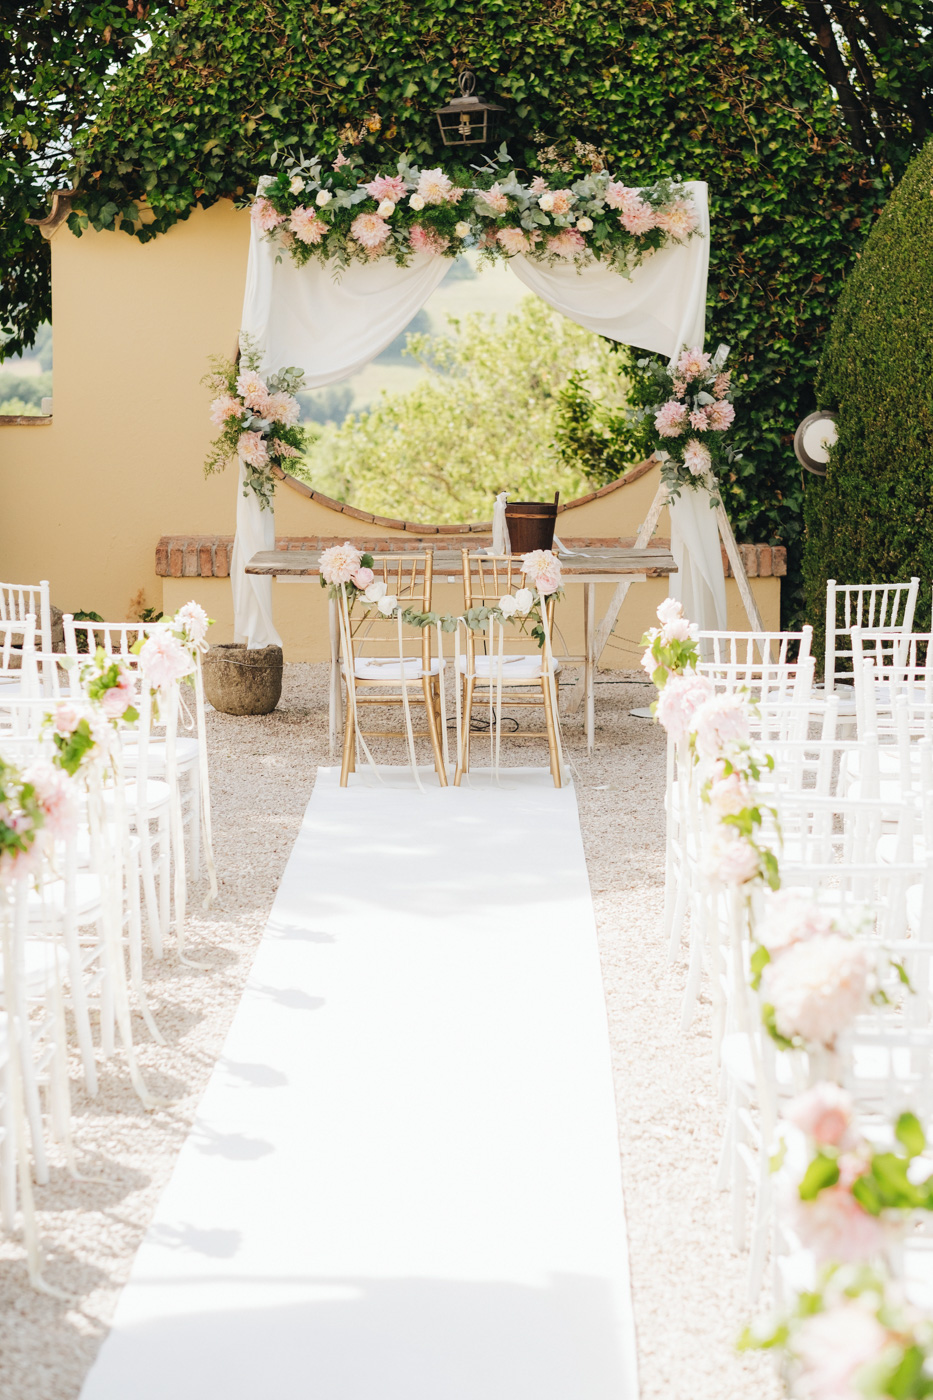 Matrimoni all'italiana wedding photographer italy-4.jpg